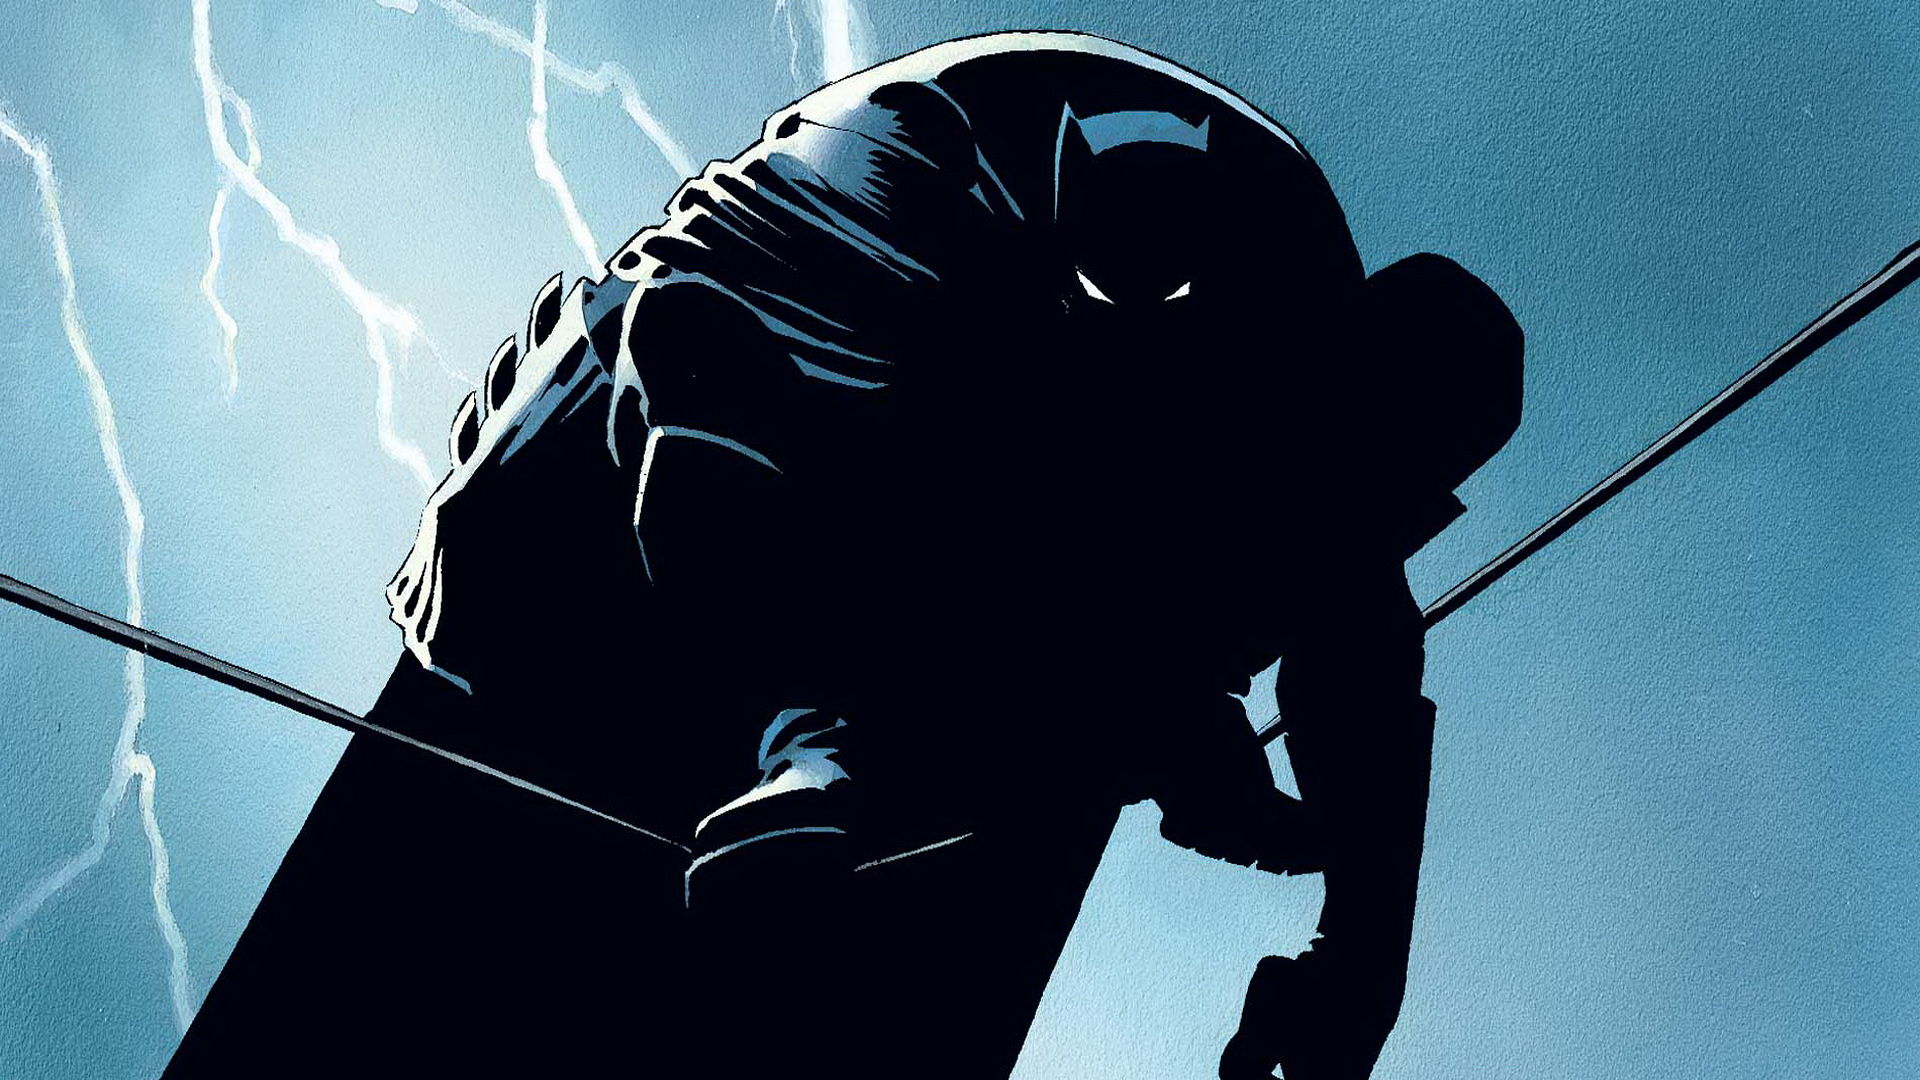 49 Batman Dark Knight Returns Wallpaper On Wallpapersafari